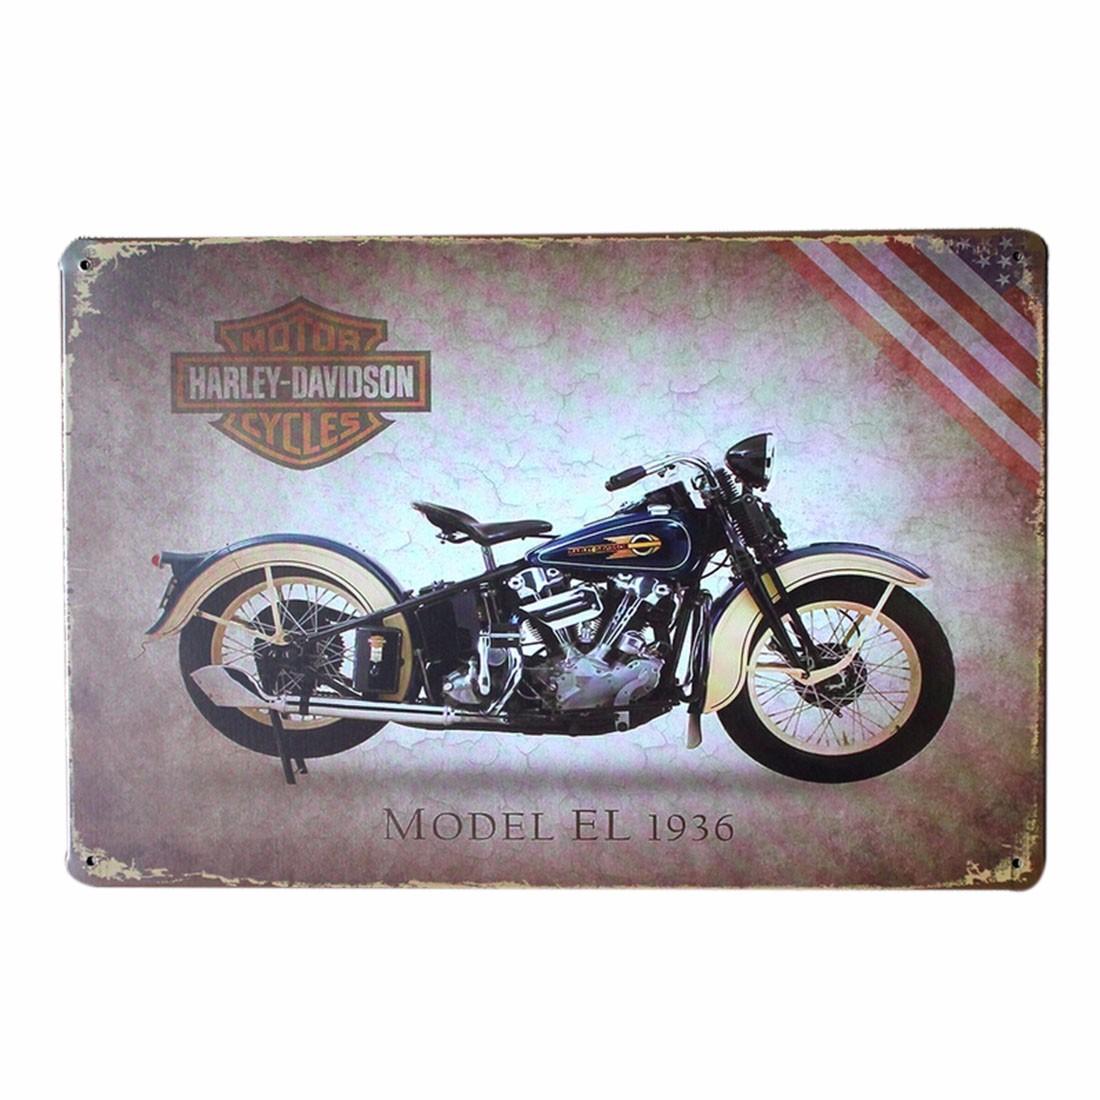 Motorcycle Sports Car Retro Pub Bar Metal Plaque Decor Sign Wall Tin Poster